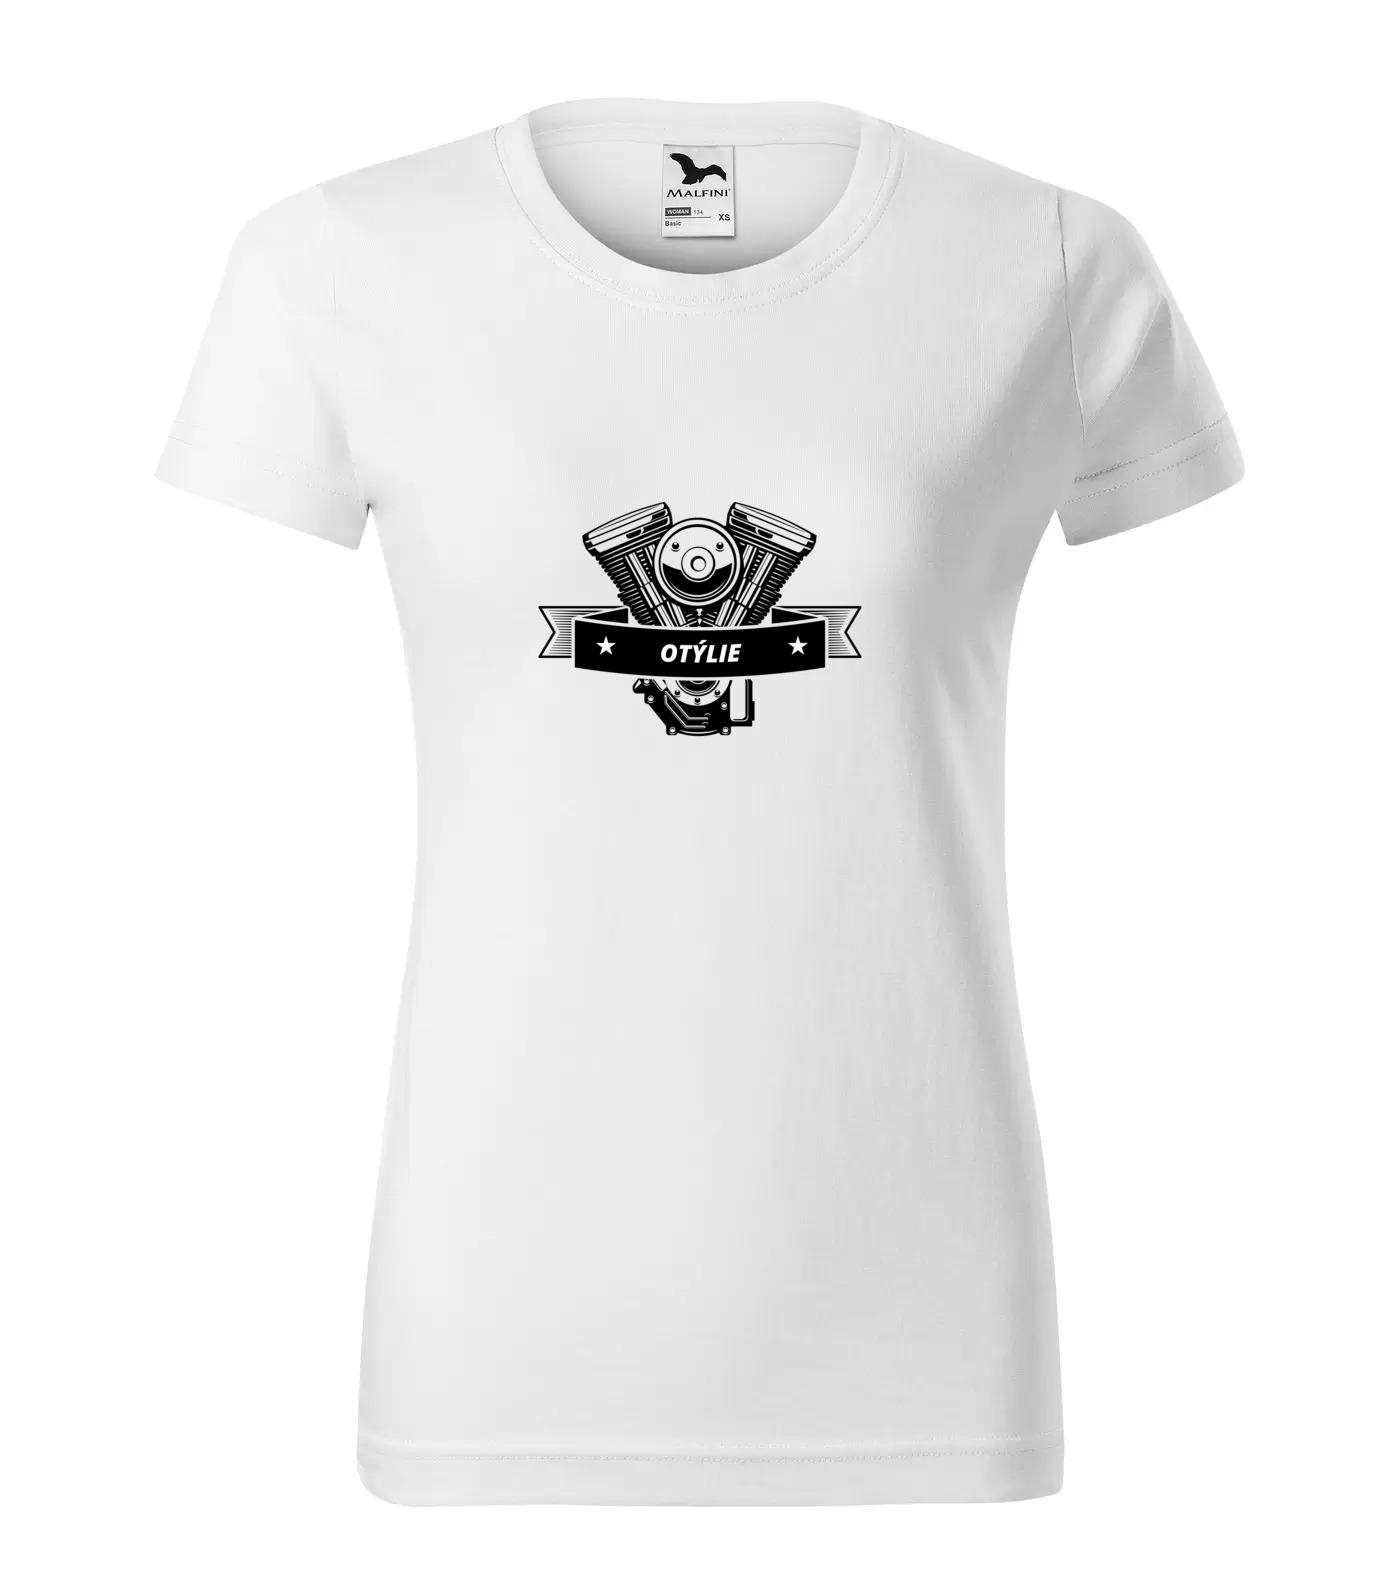 Tričko Motorkářka Otýlie